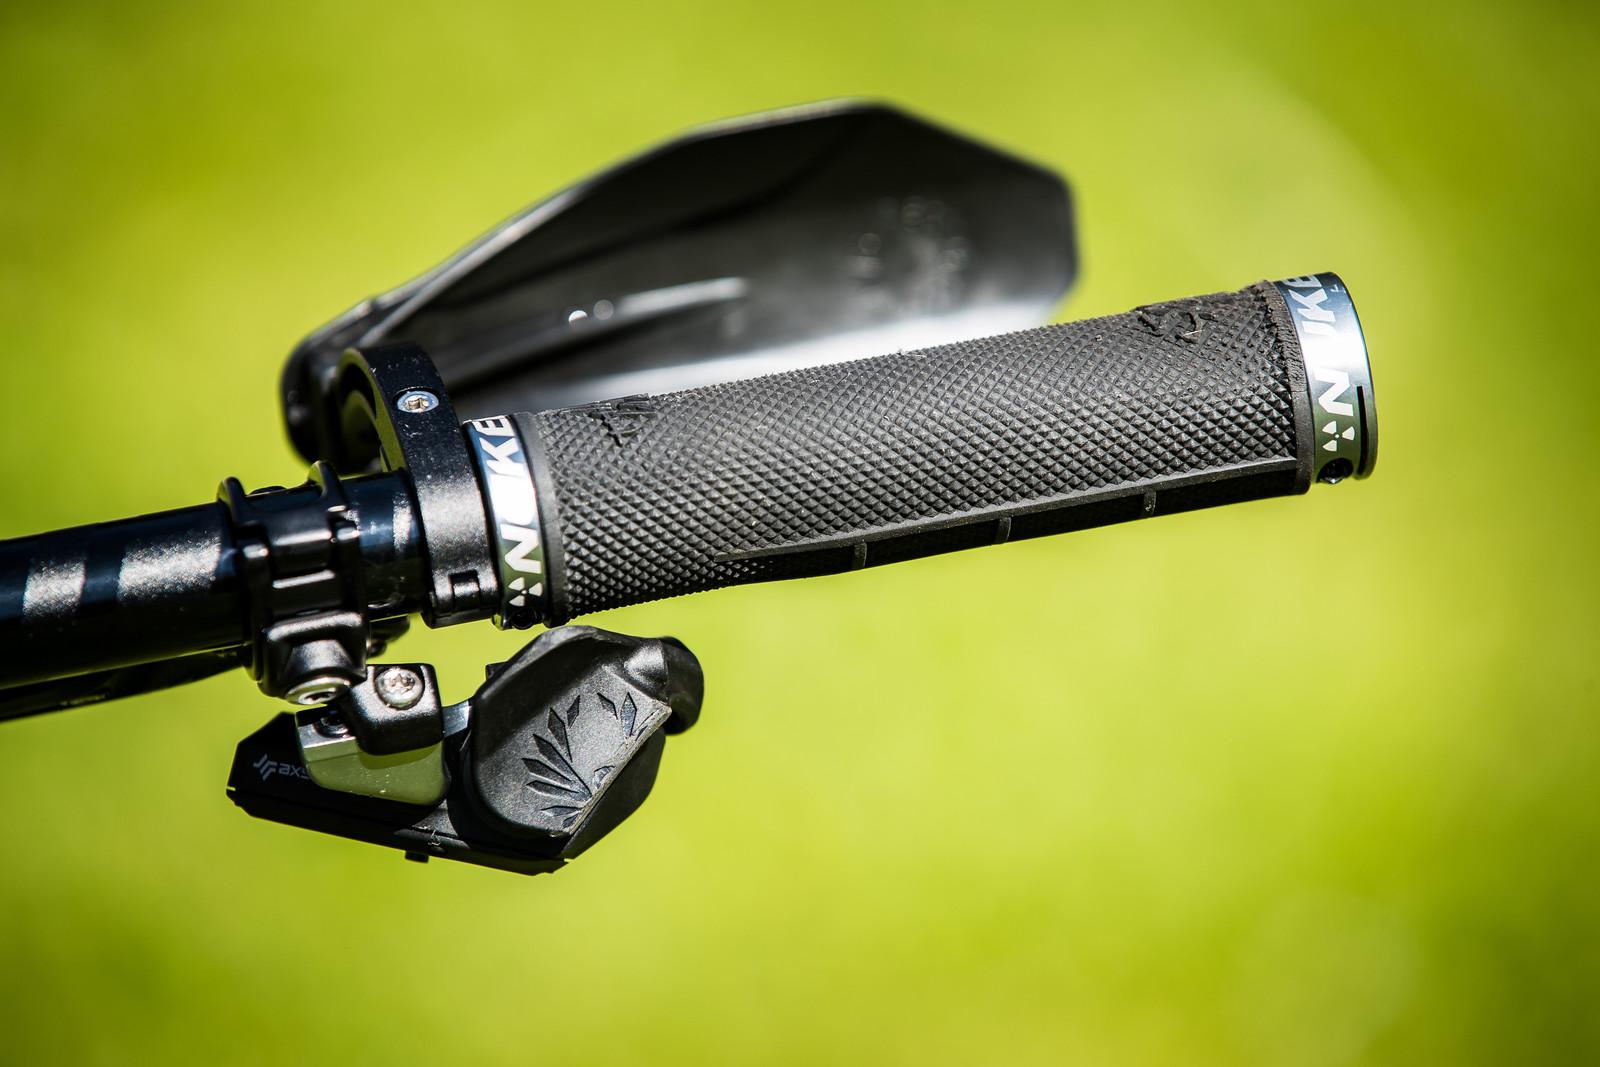 SRAM AXS Shifter - Sam Hill's Updated Prototype Nukeproof Mega 29 with SRAM AXS - Mountain Biking Pictures - Vital MTB